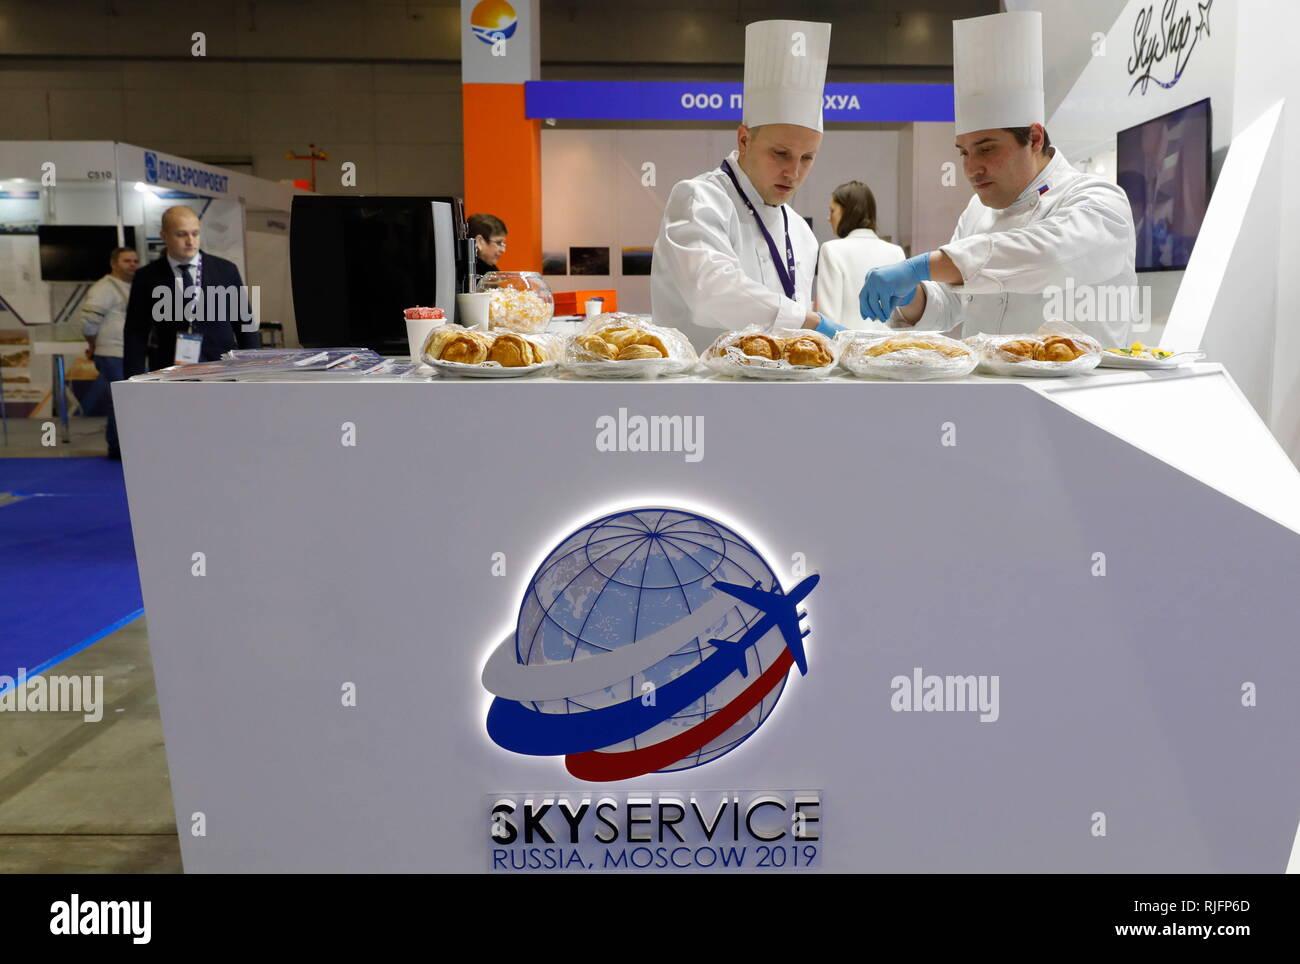 International Food Expo 2019 Stock Photos & International Food Expo